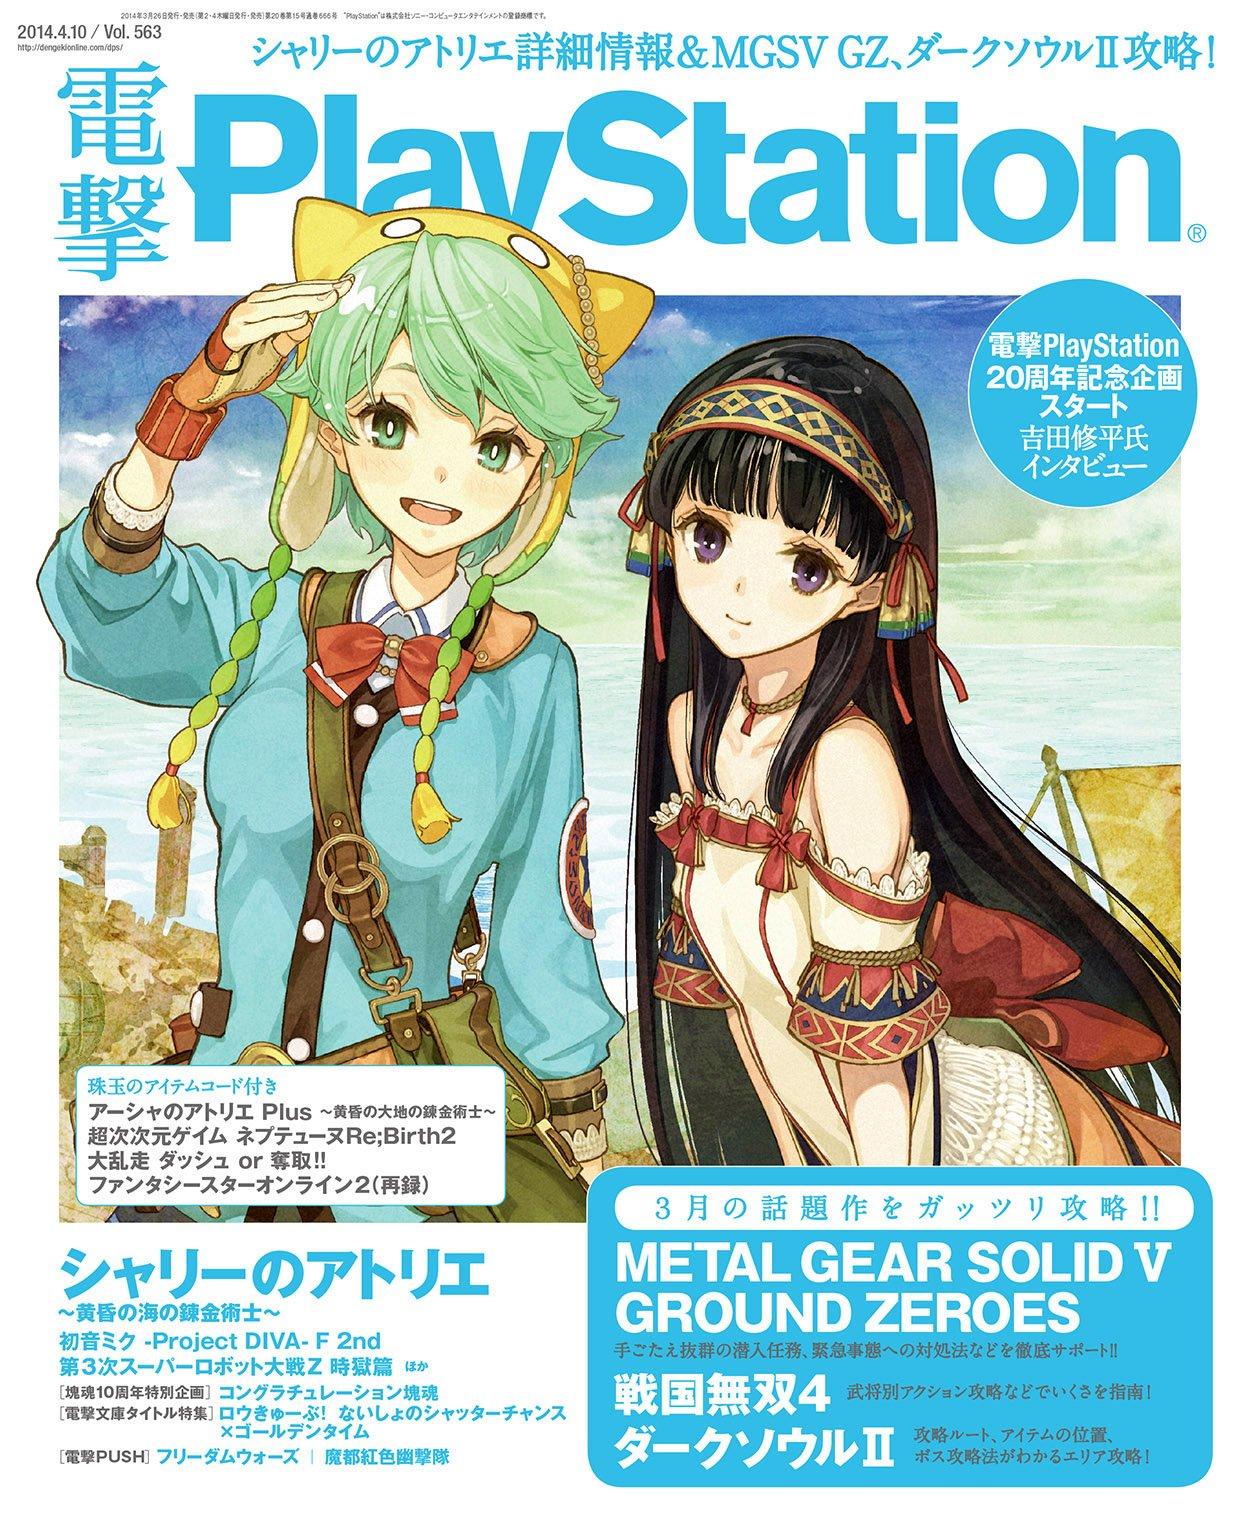 Dengeki PlayStation 563 (April 10, 2014)